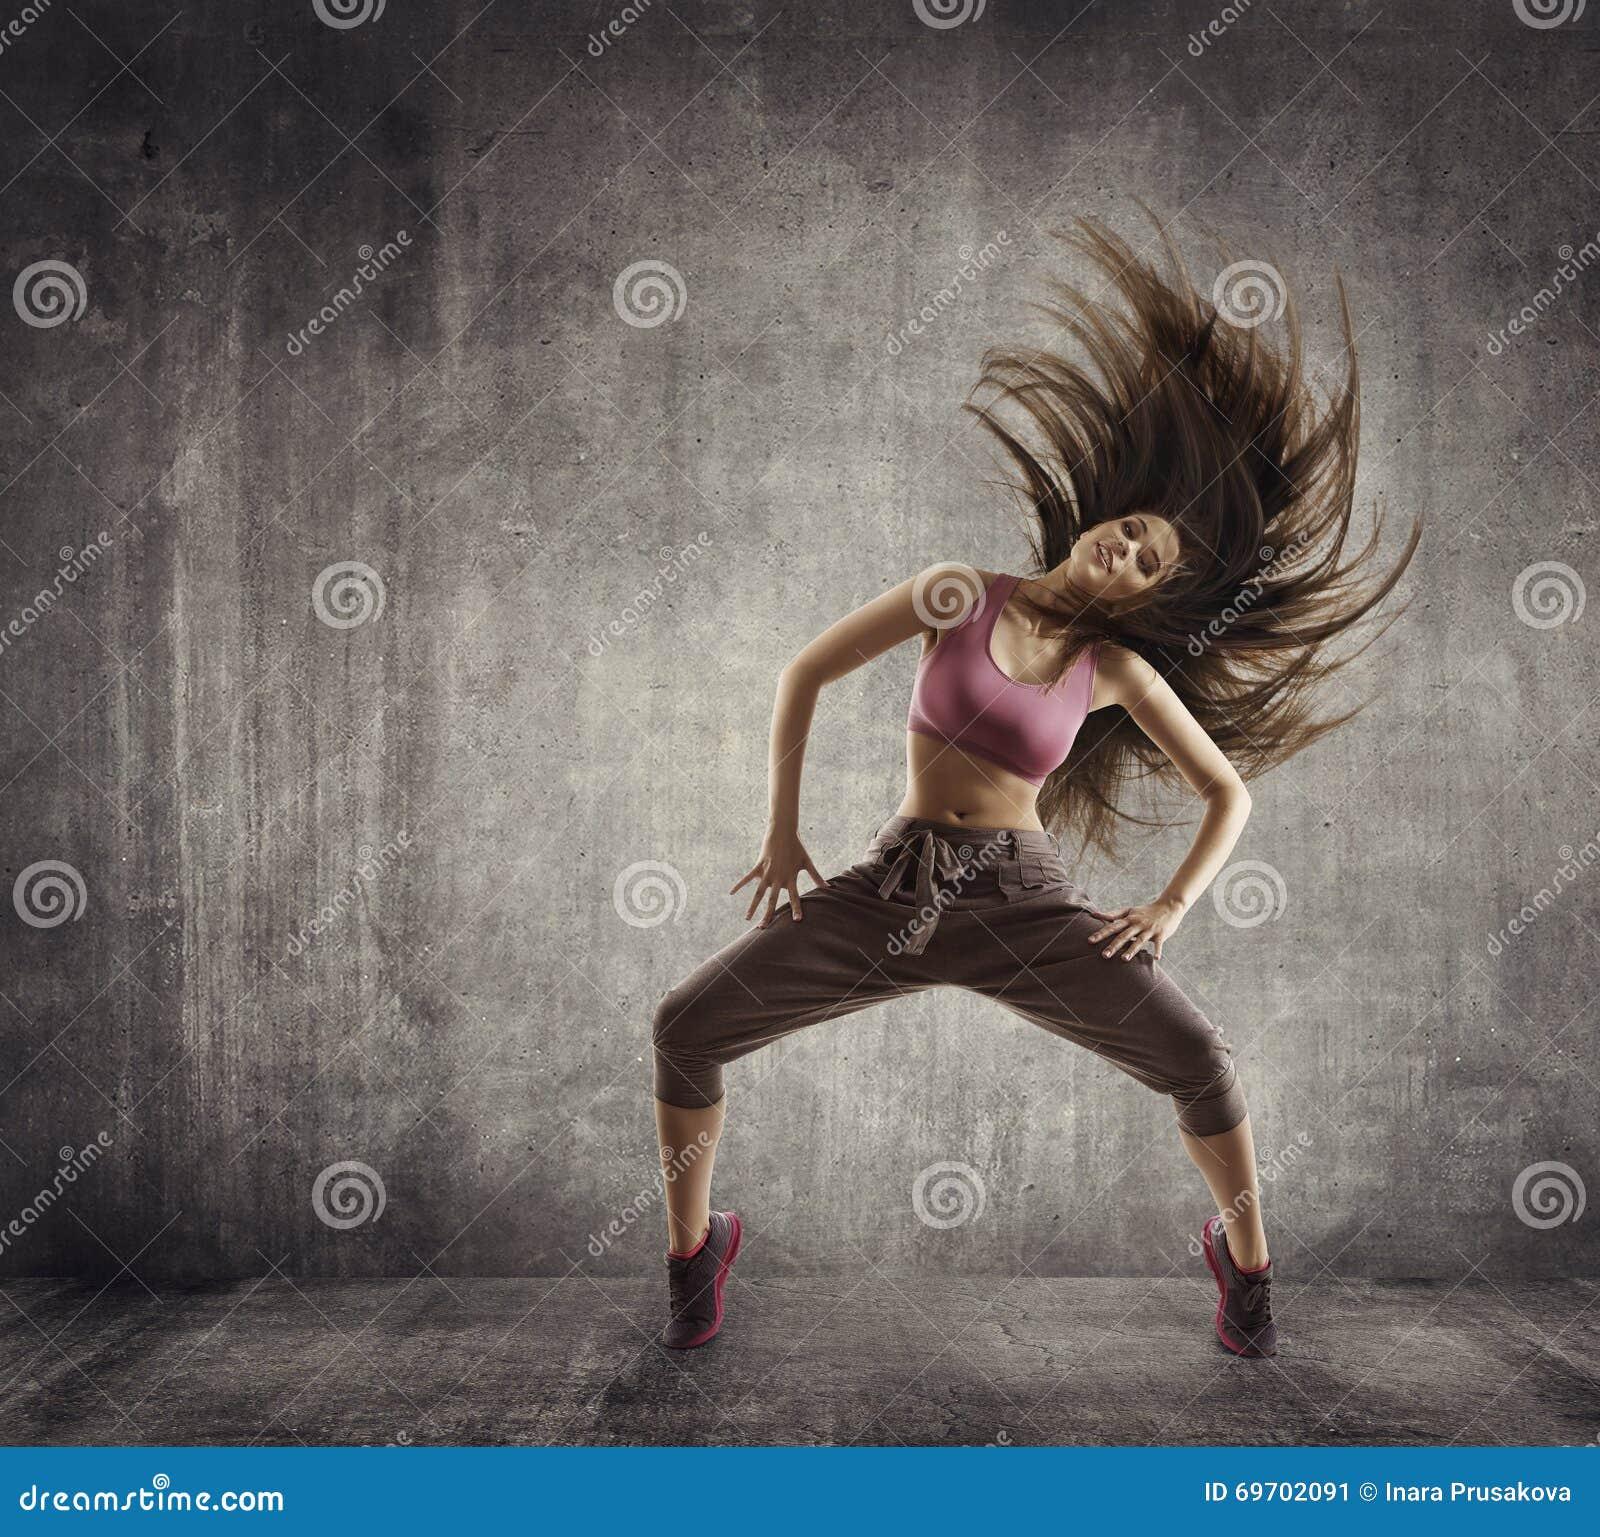 Fitness Sport Dance, Woman Dancer Flying Hair Dancing, Concrete